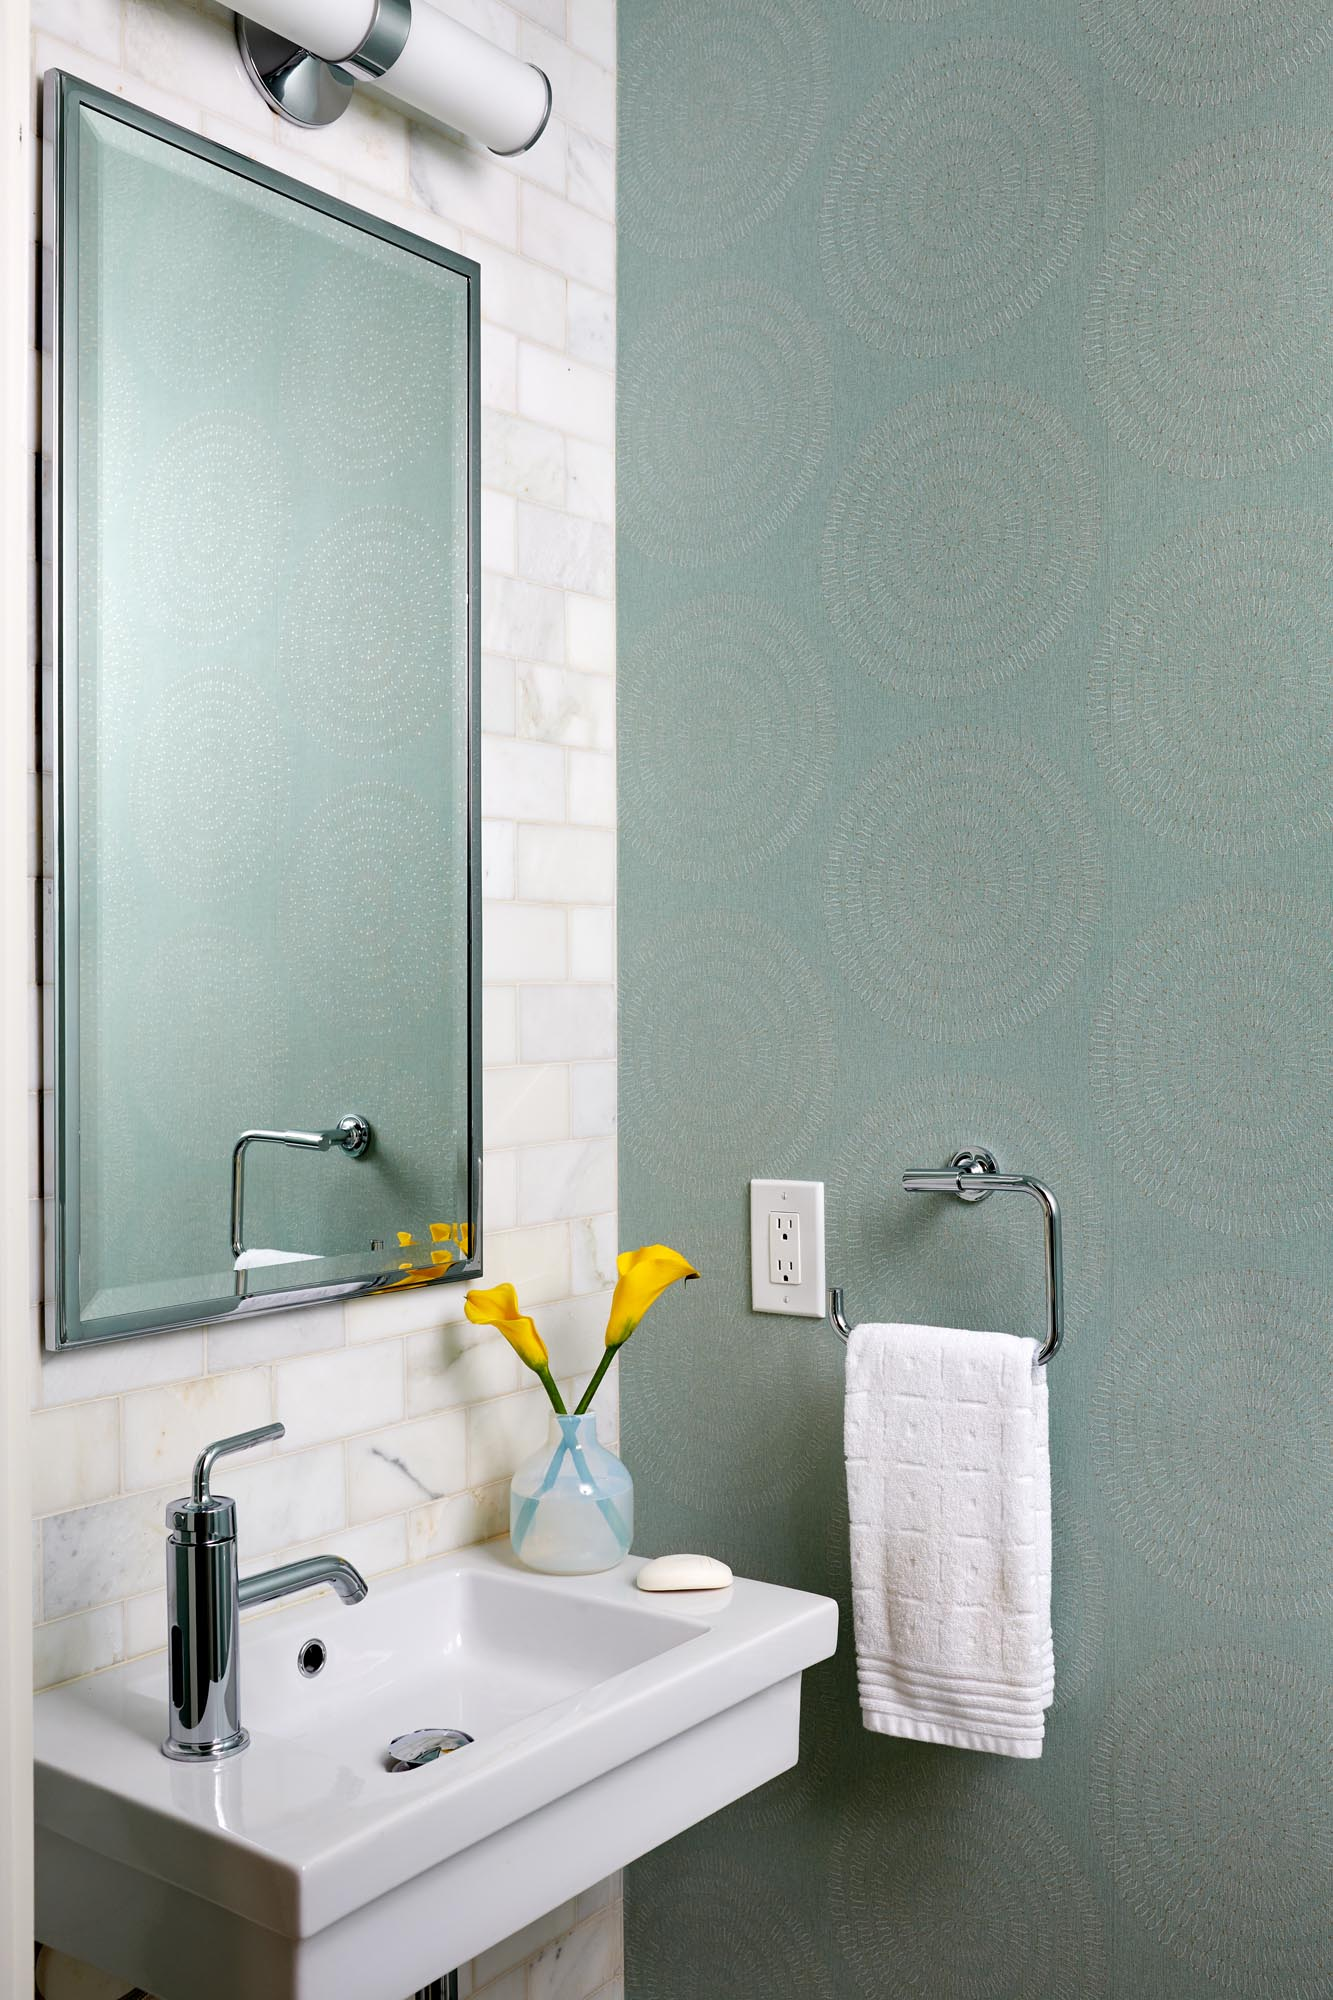 Boston powder room interior design by Dane Austin Design